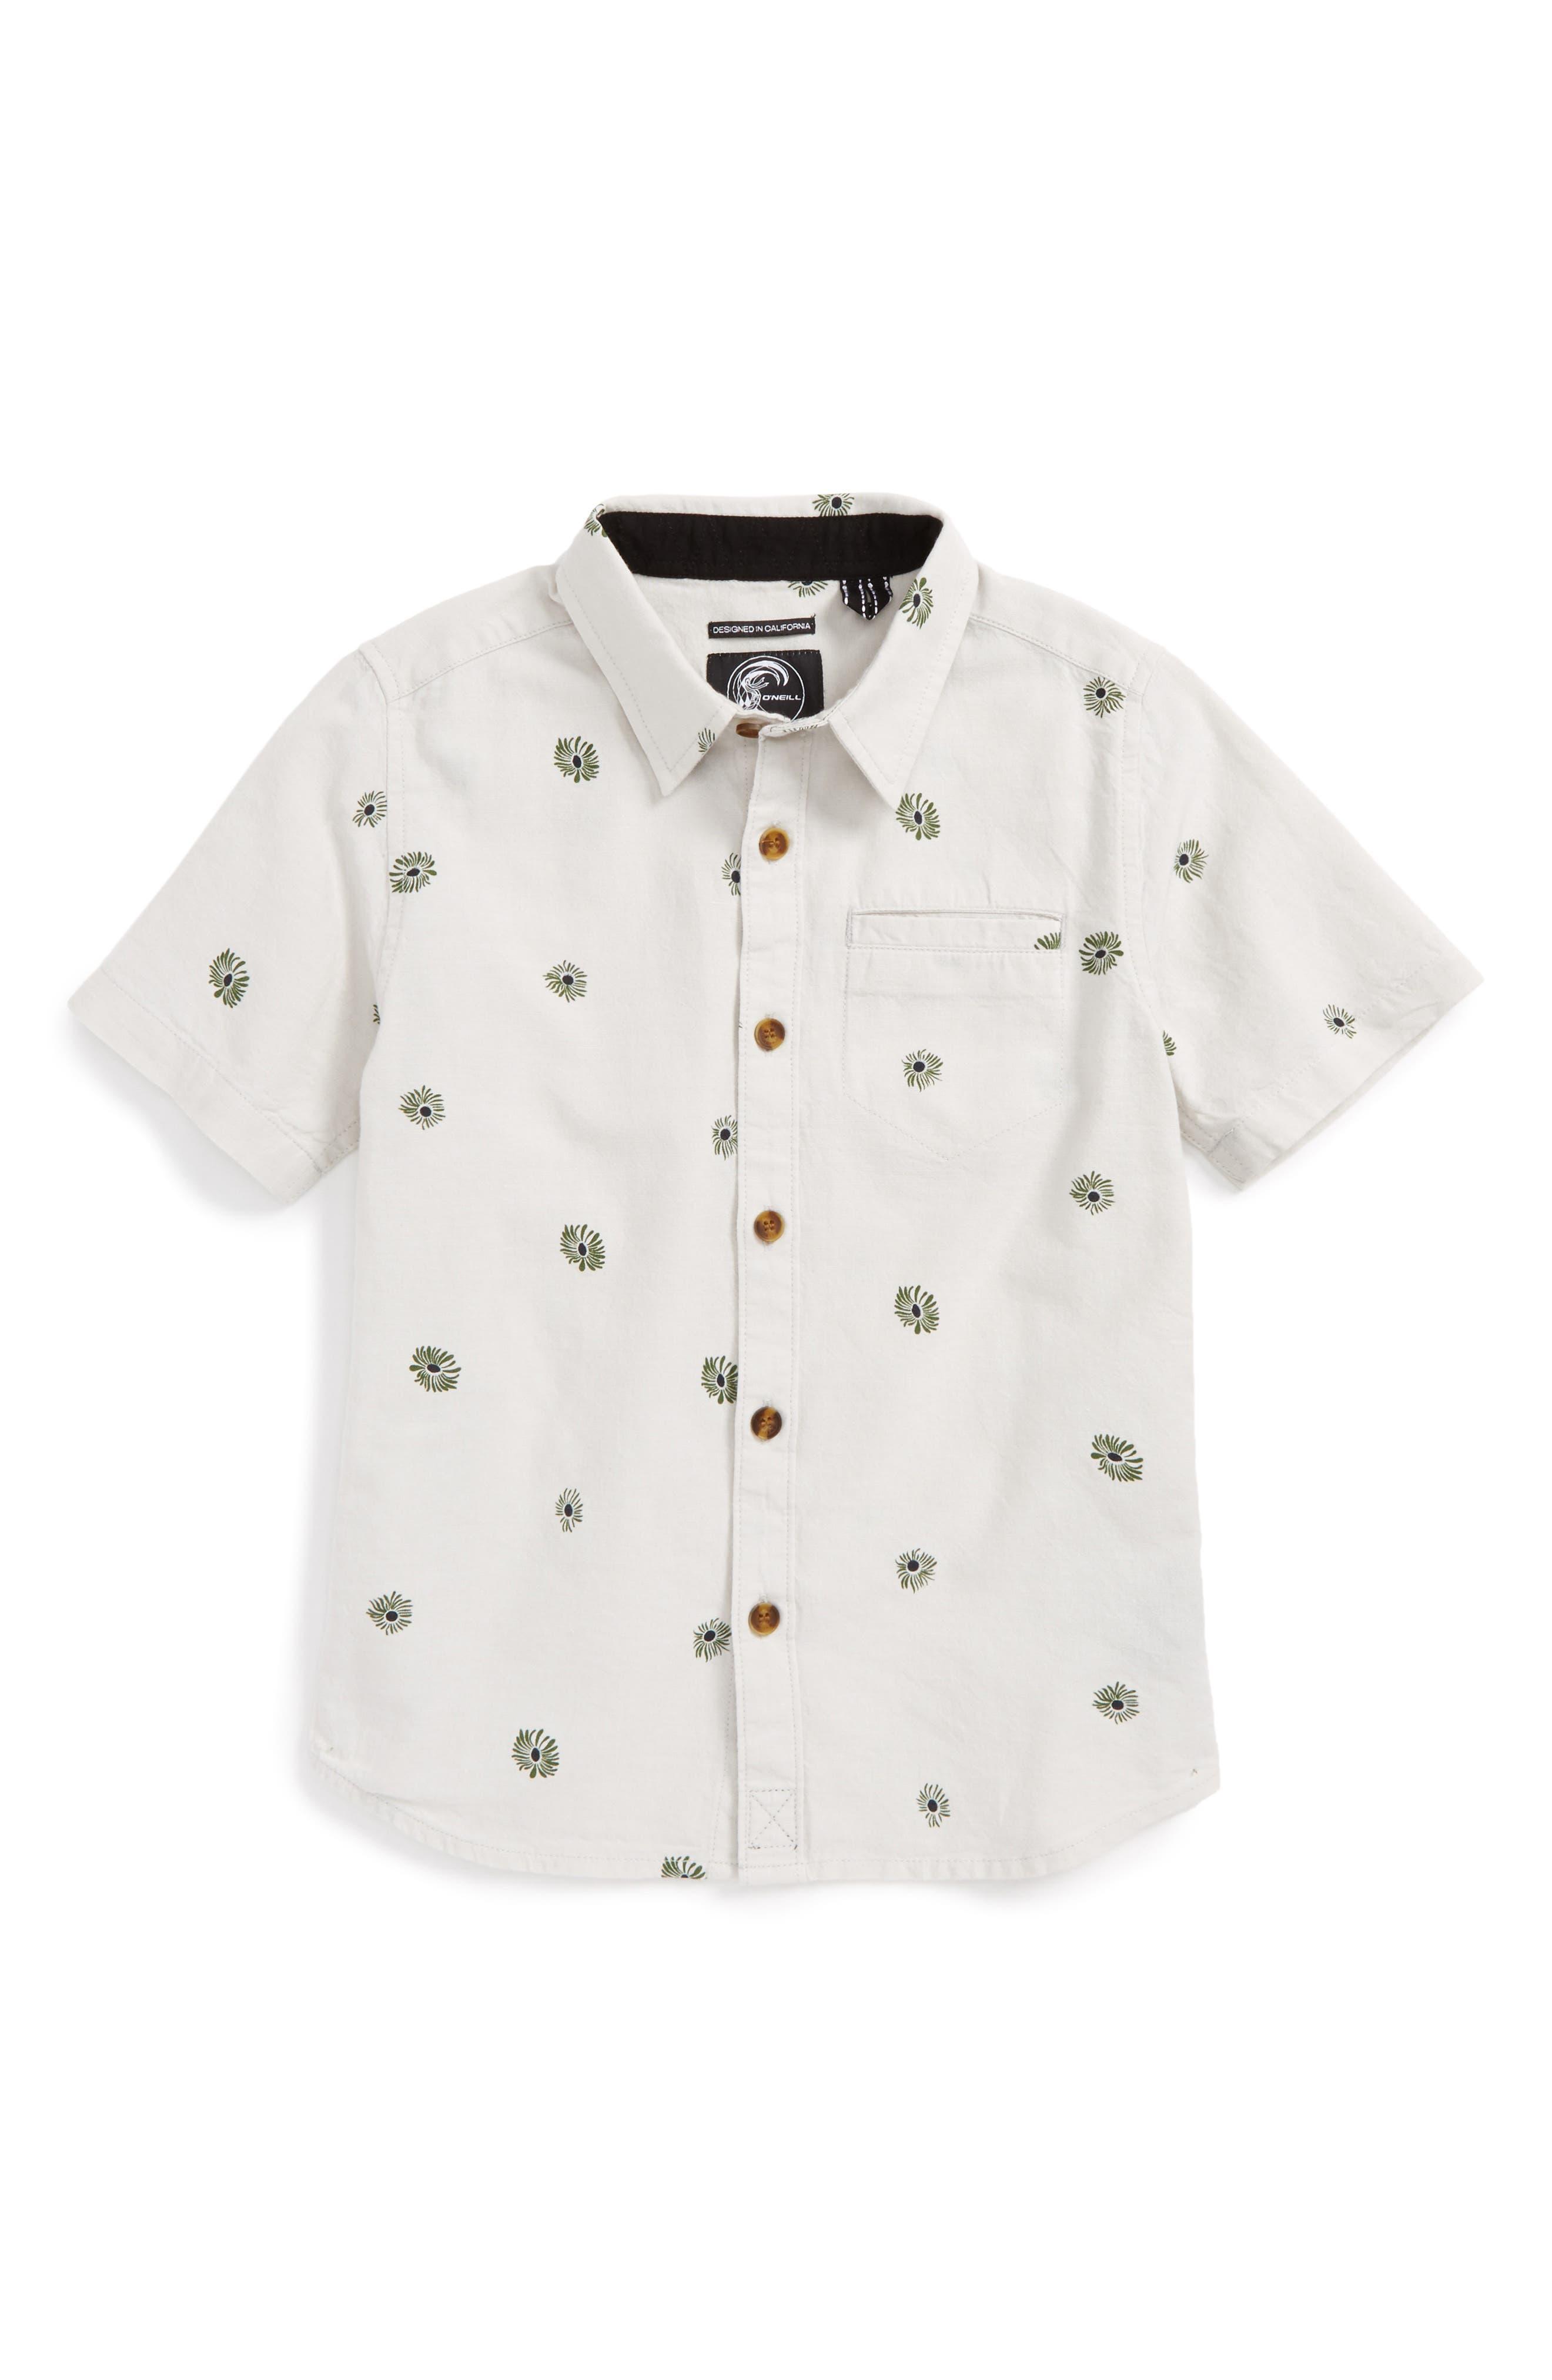 Brees Short Sleeve Woven Shirt,                             Main thumbnail 1, color,                             036